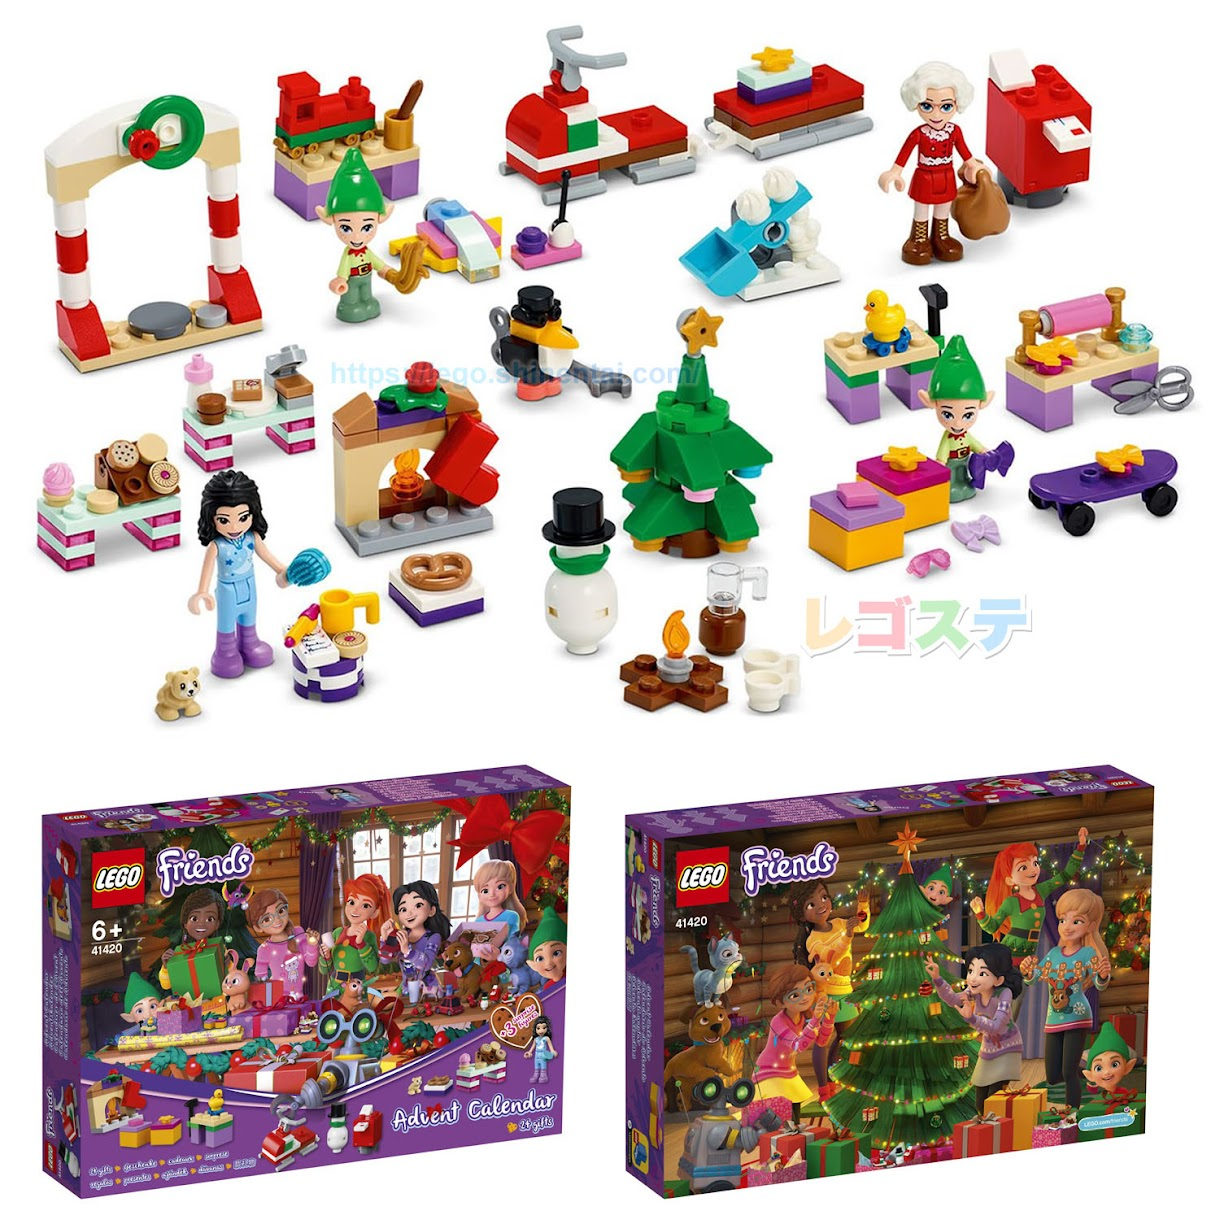 LEGO 41420 フレンズ 2020 アドベントカレンダー:LEGO Friends 2020 Advent Calendar